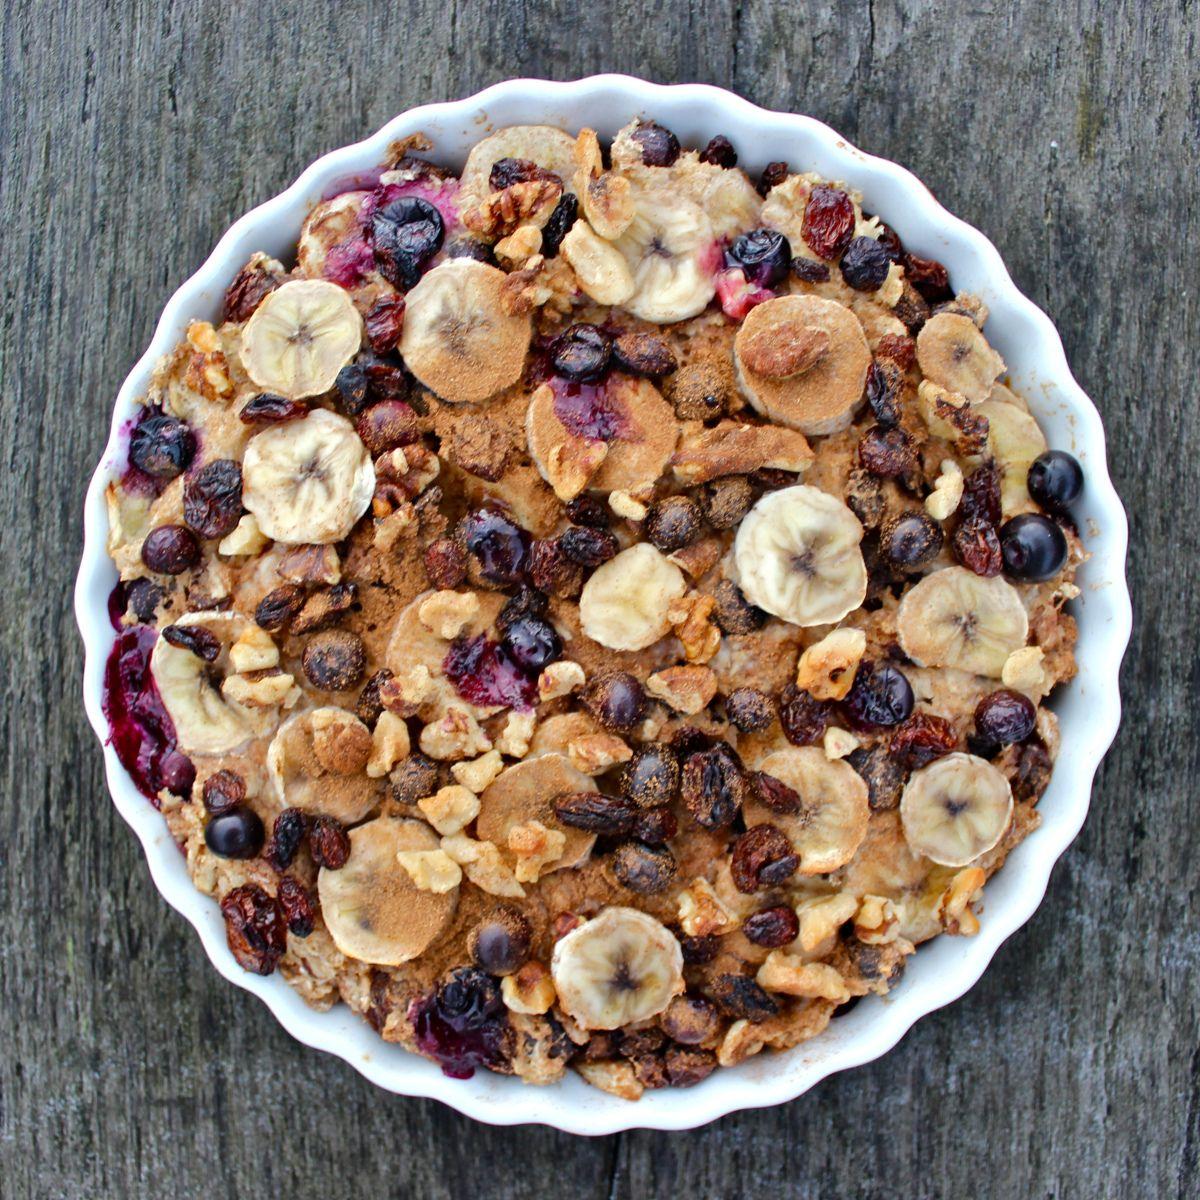 Baked banana, blueberry and raisin oatmeal: vegan, gluten free, dairy free | Deliciously Ella